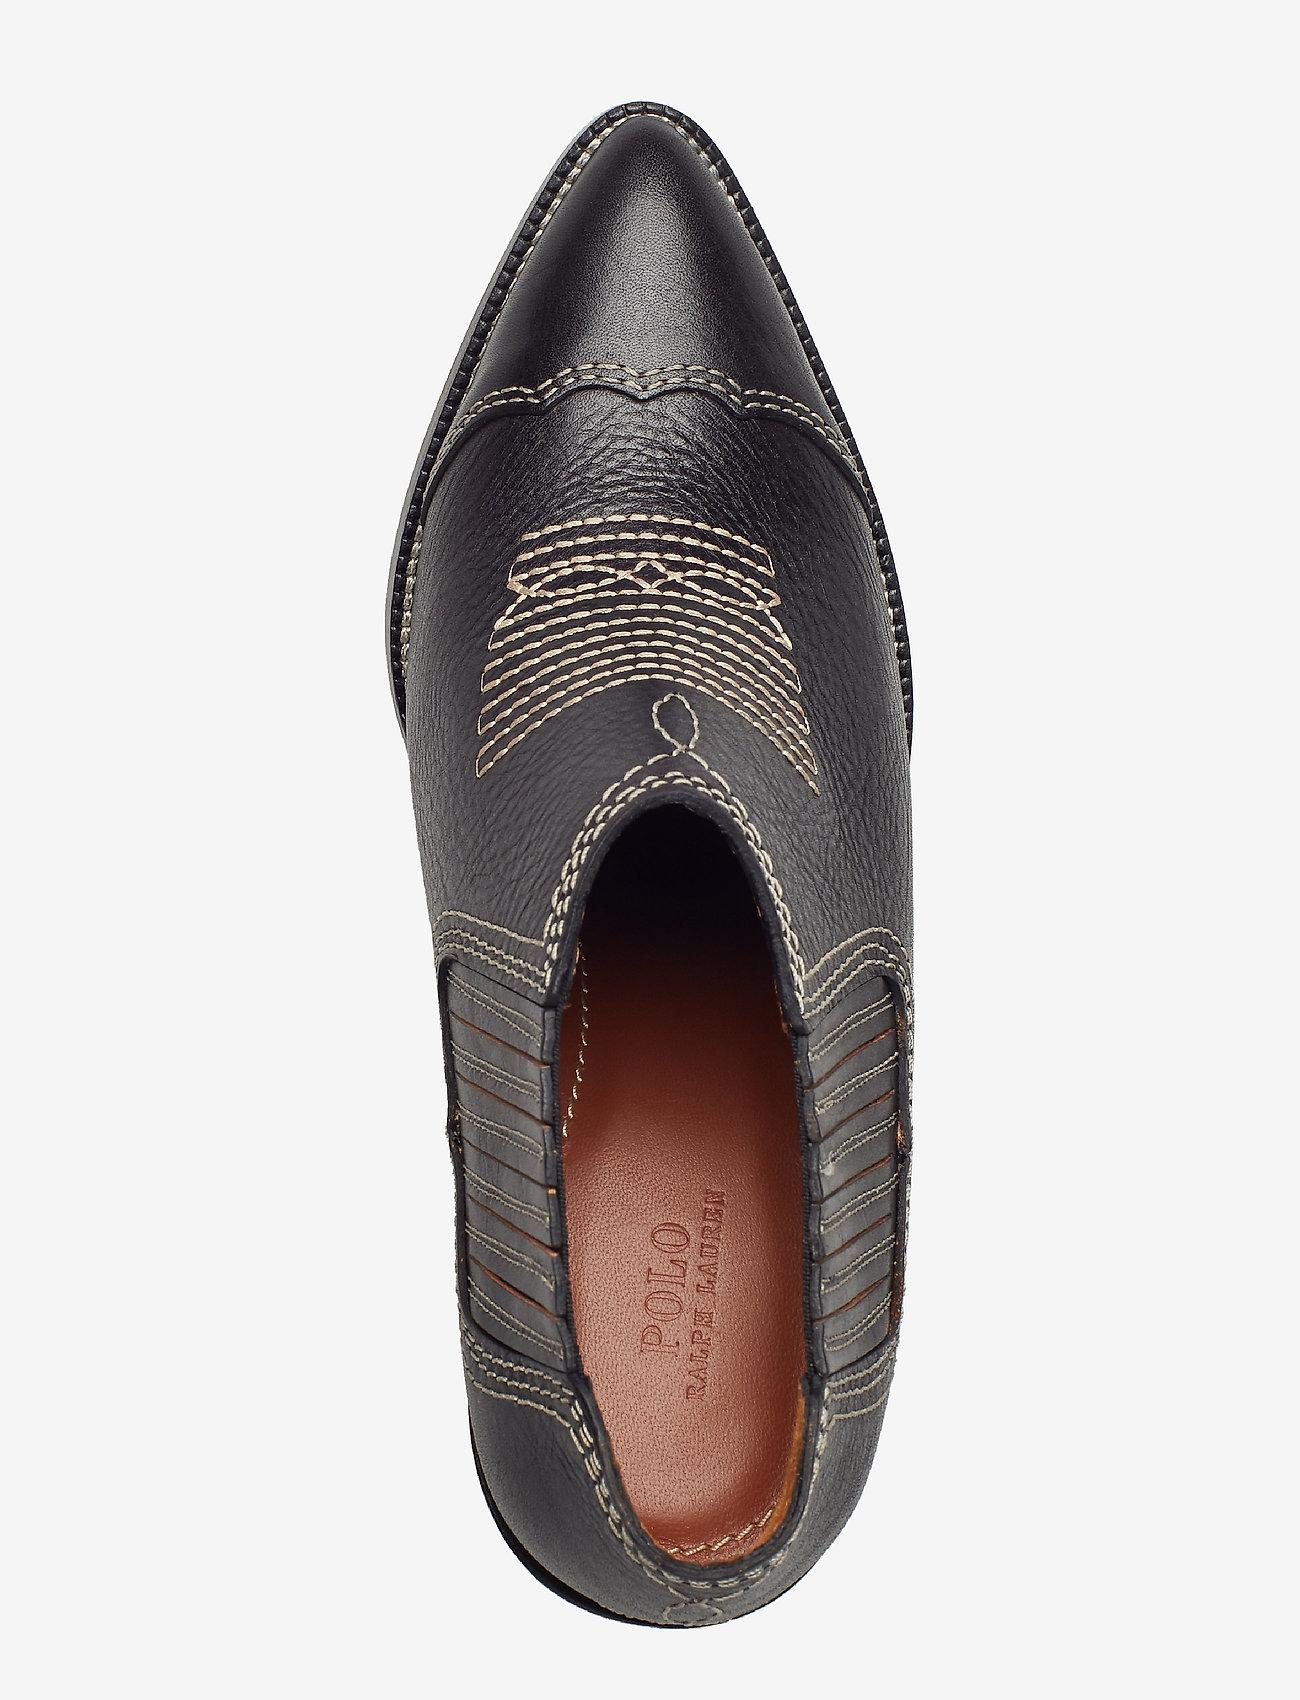 Lowrey Leather Bootie (Black) - Polo Ralph Lauren